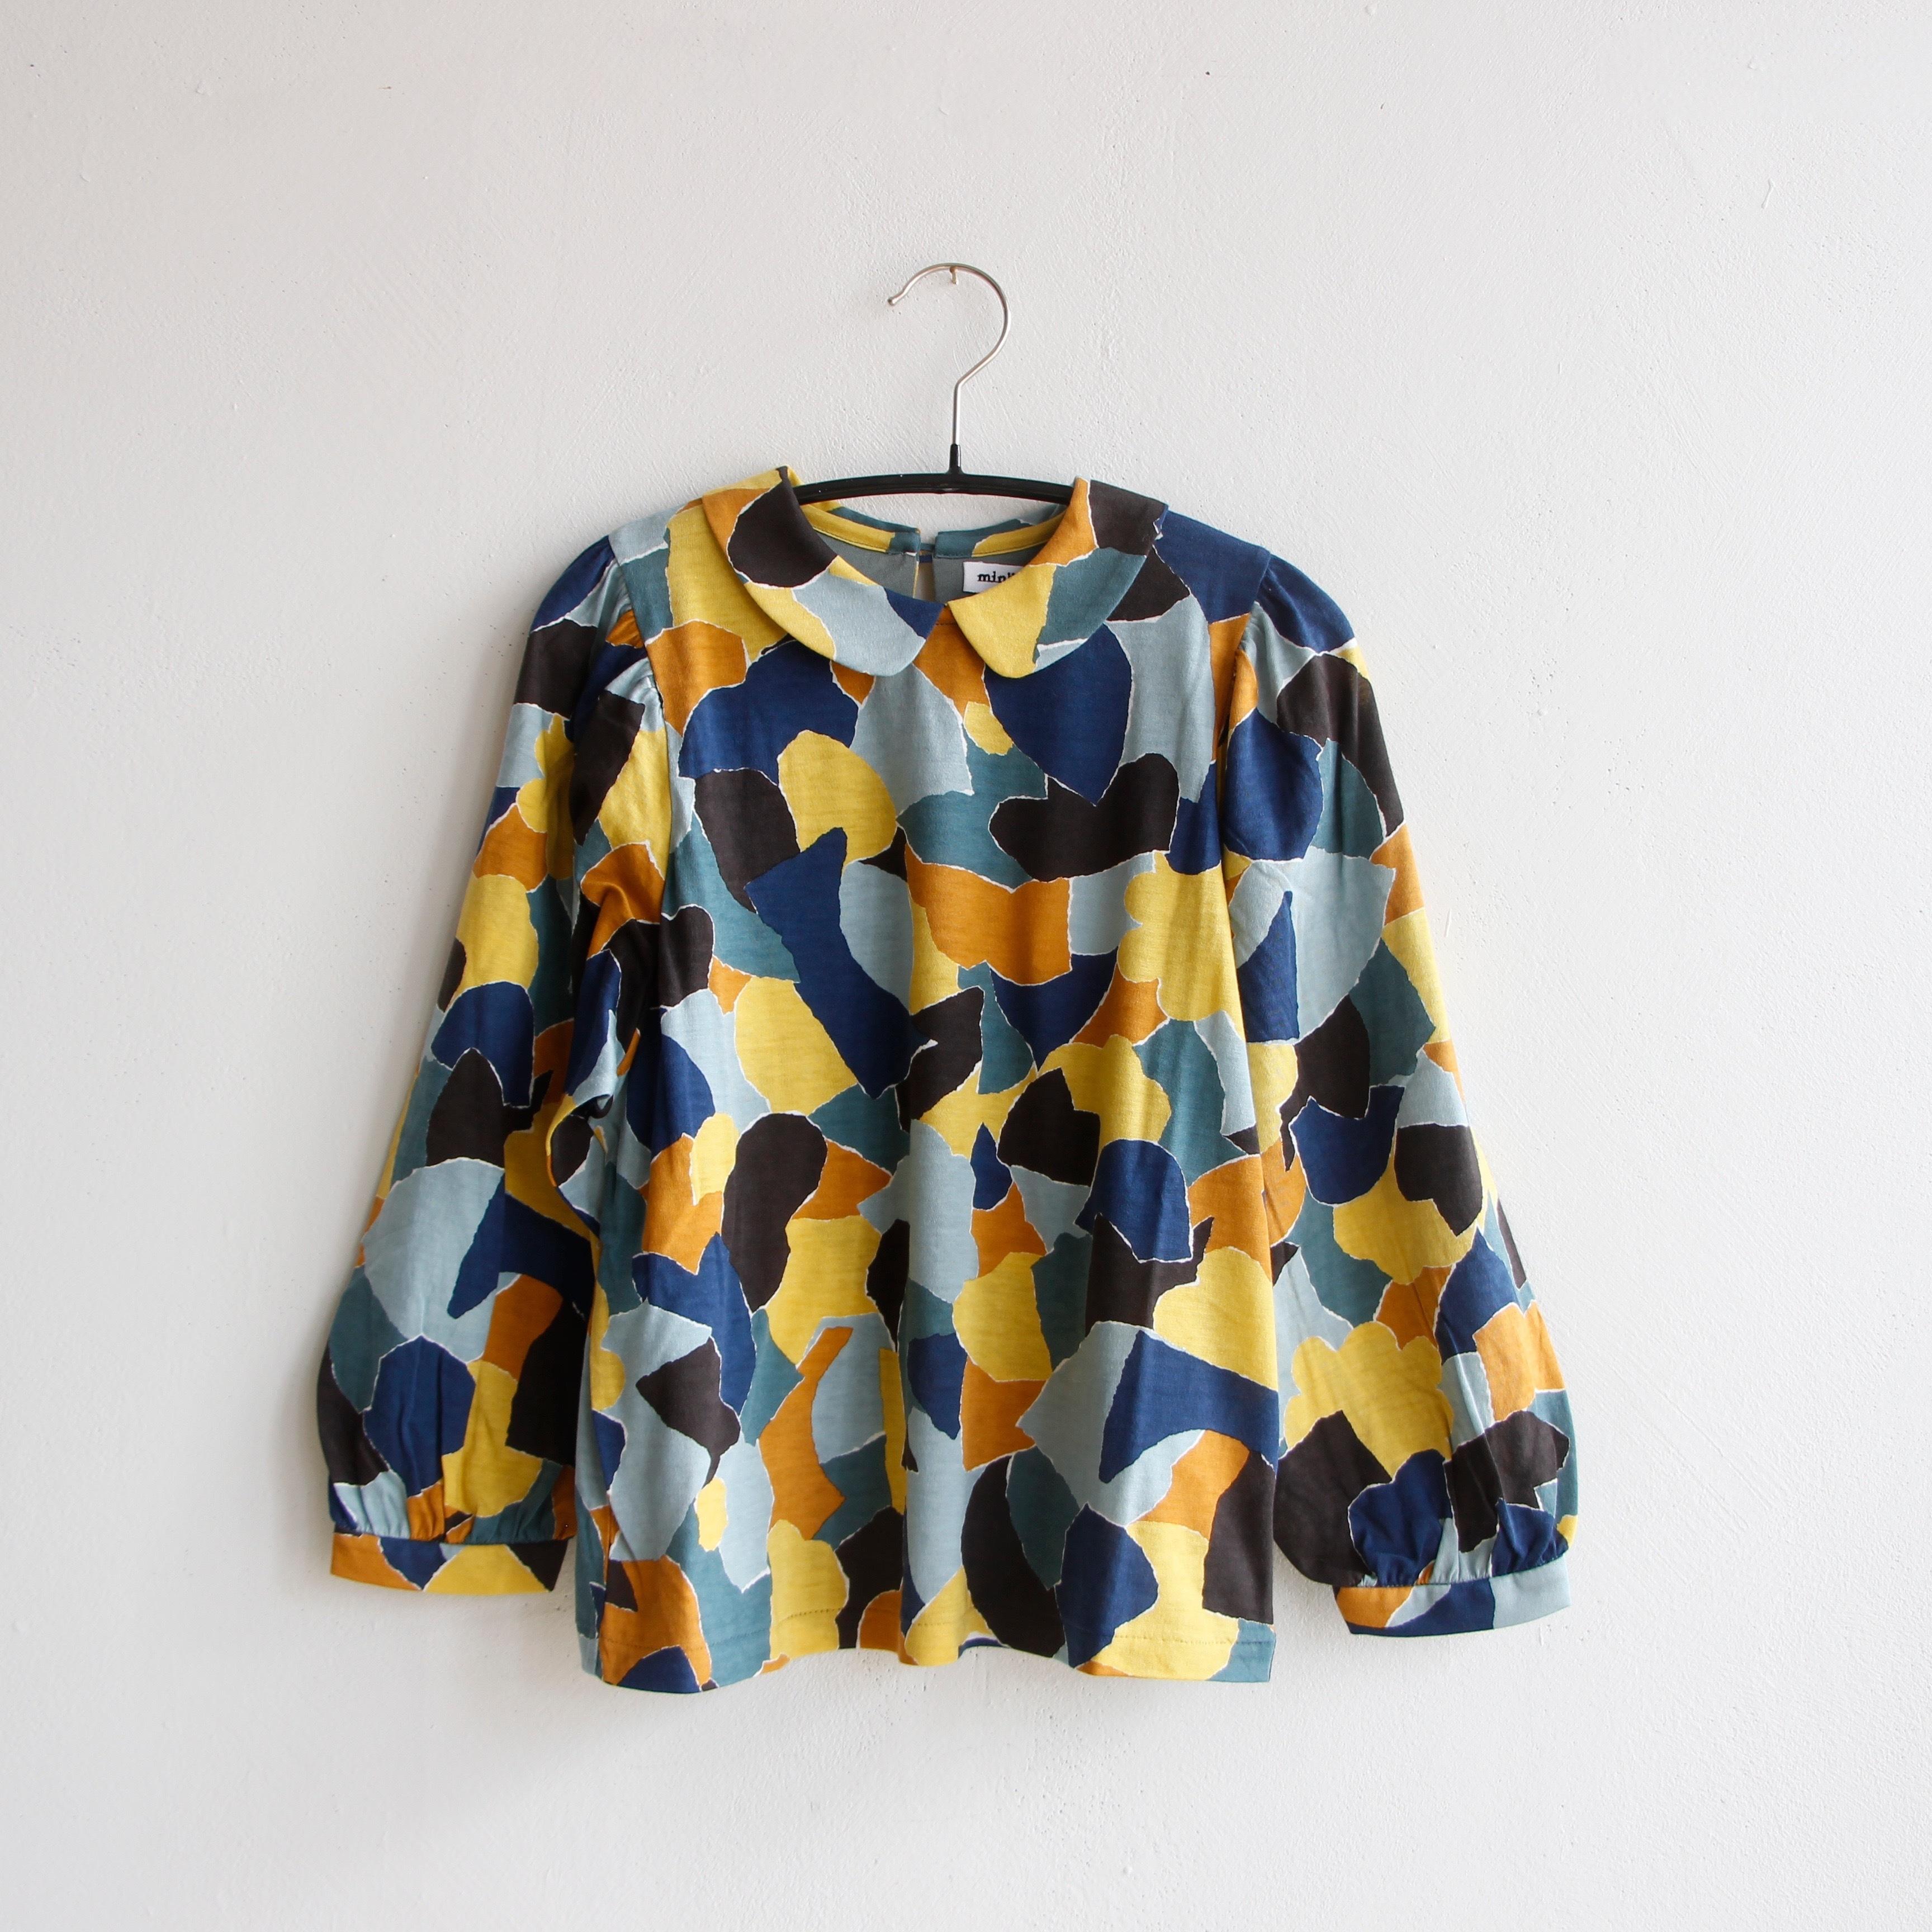 《mina perhonen 2020AW》foliage 長袖カットソー / yellow mix / 110-140cm